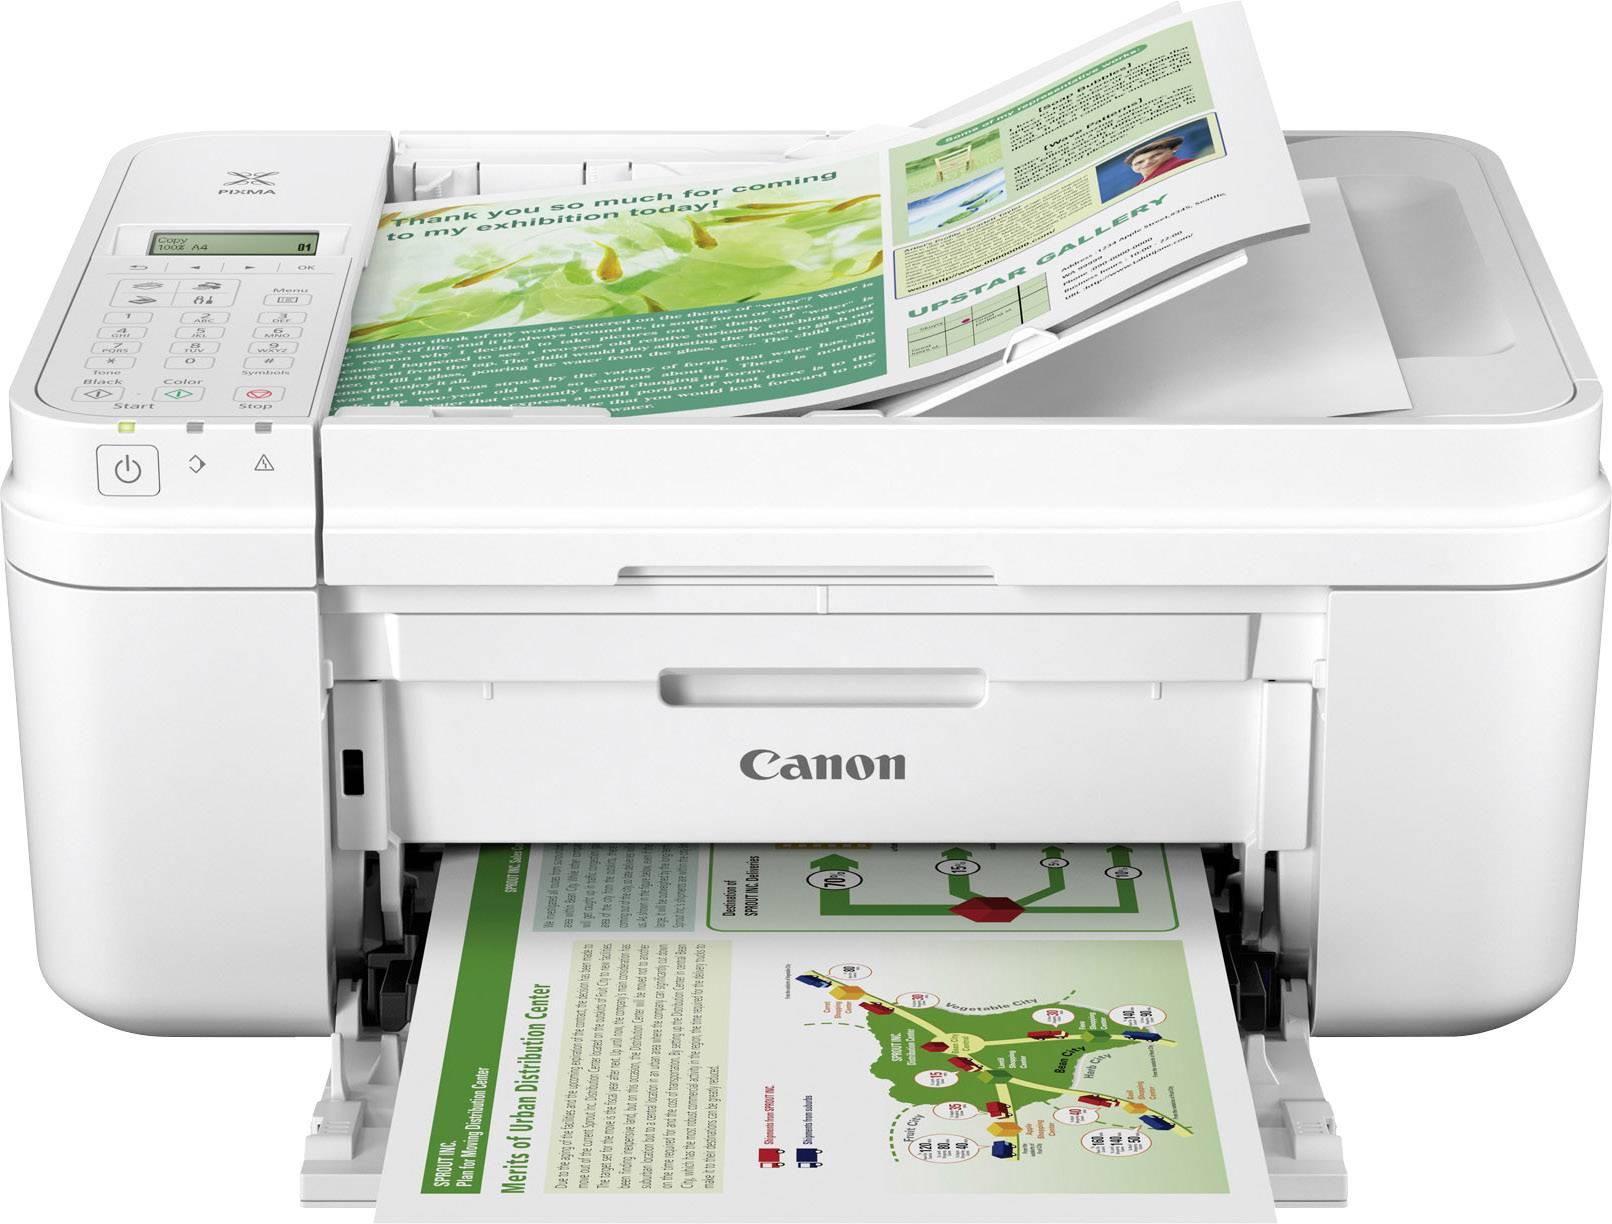 Canon pixma mx495 tintenstrahl multifunktionsdrucker a4 for Drucker scanner kopierer